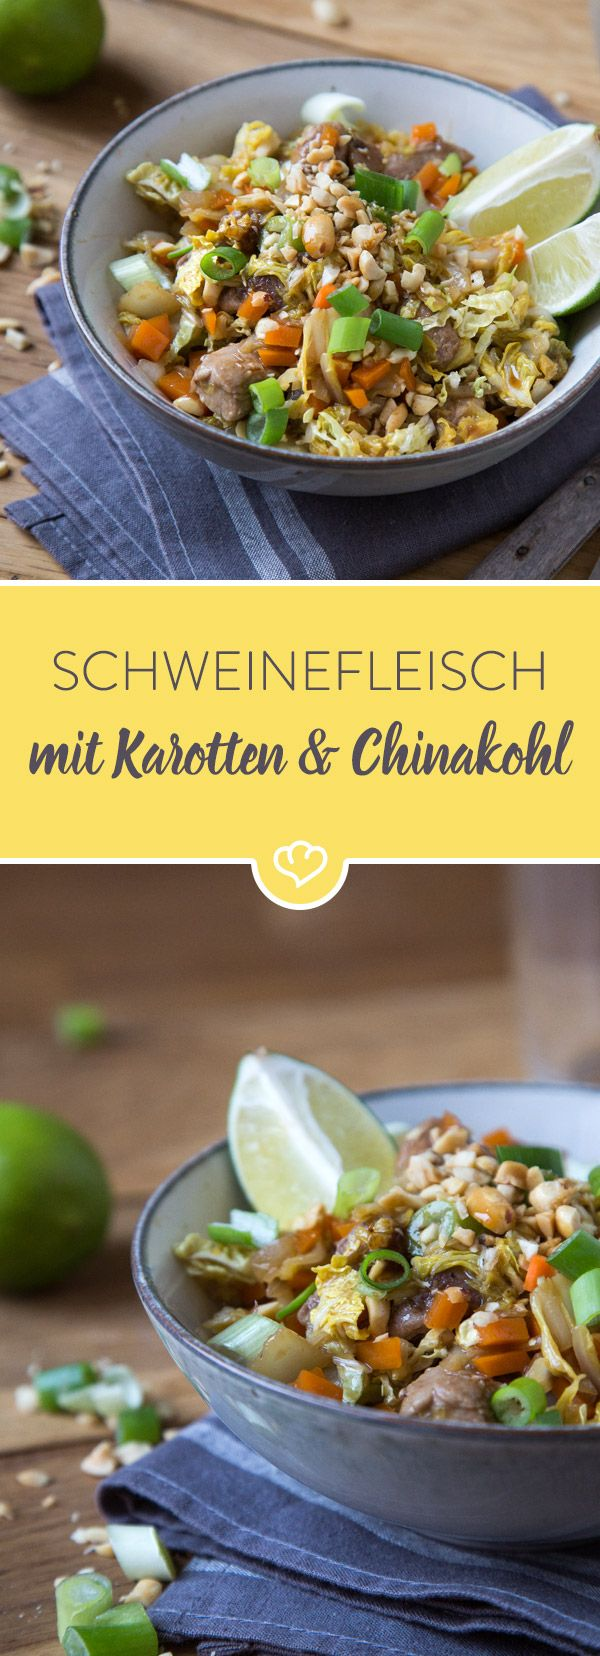 Beautiful Schnelle Küche Warm Ideas - Brentwoodseasidecabins.com ...